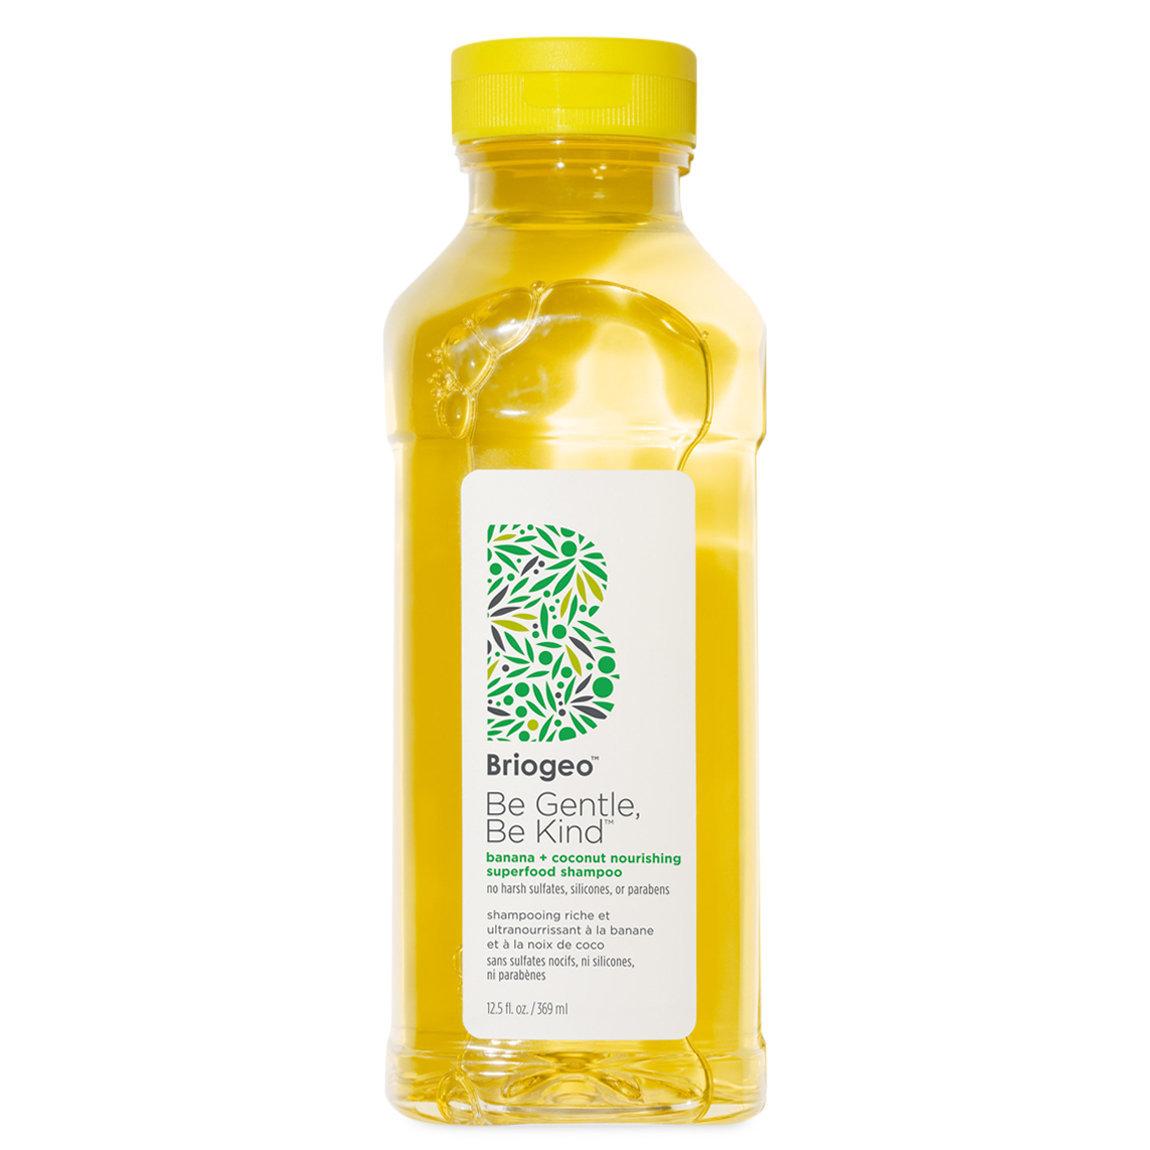 Briogeo Be Gentle, Be Kind Banana + Coconut Nourishing Superfood Shampoo product swatch.